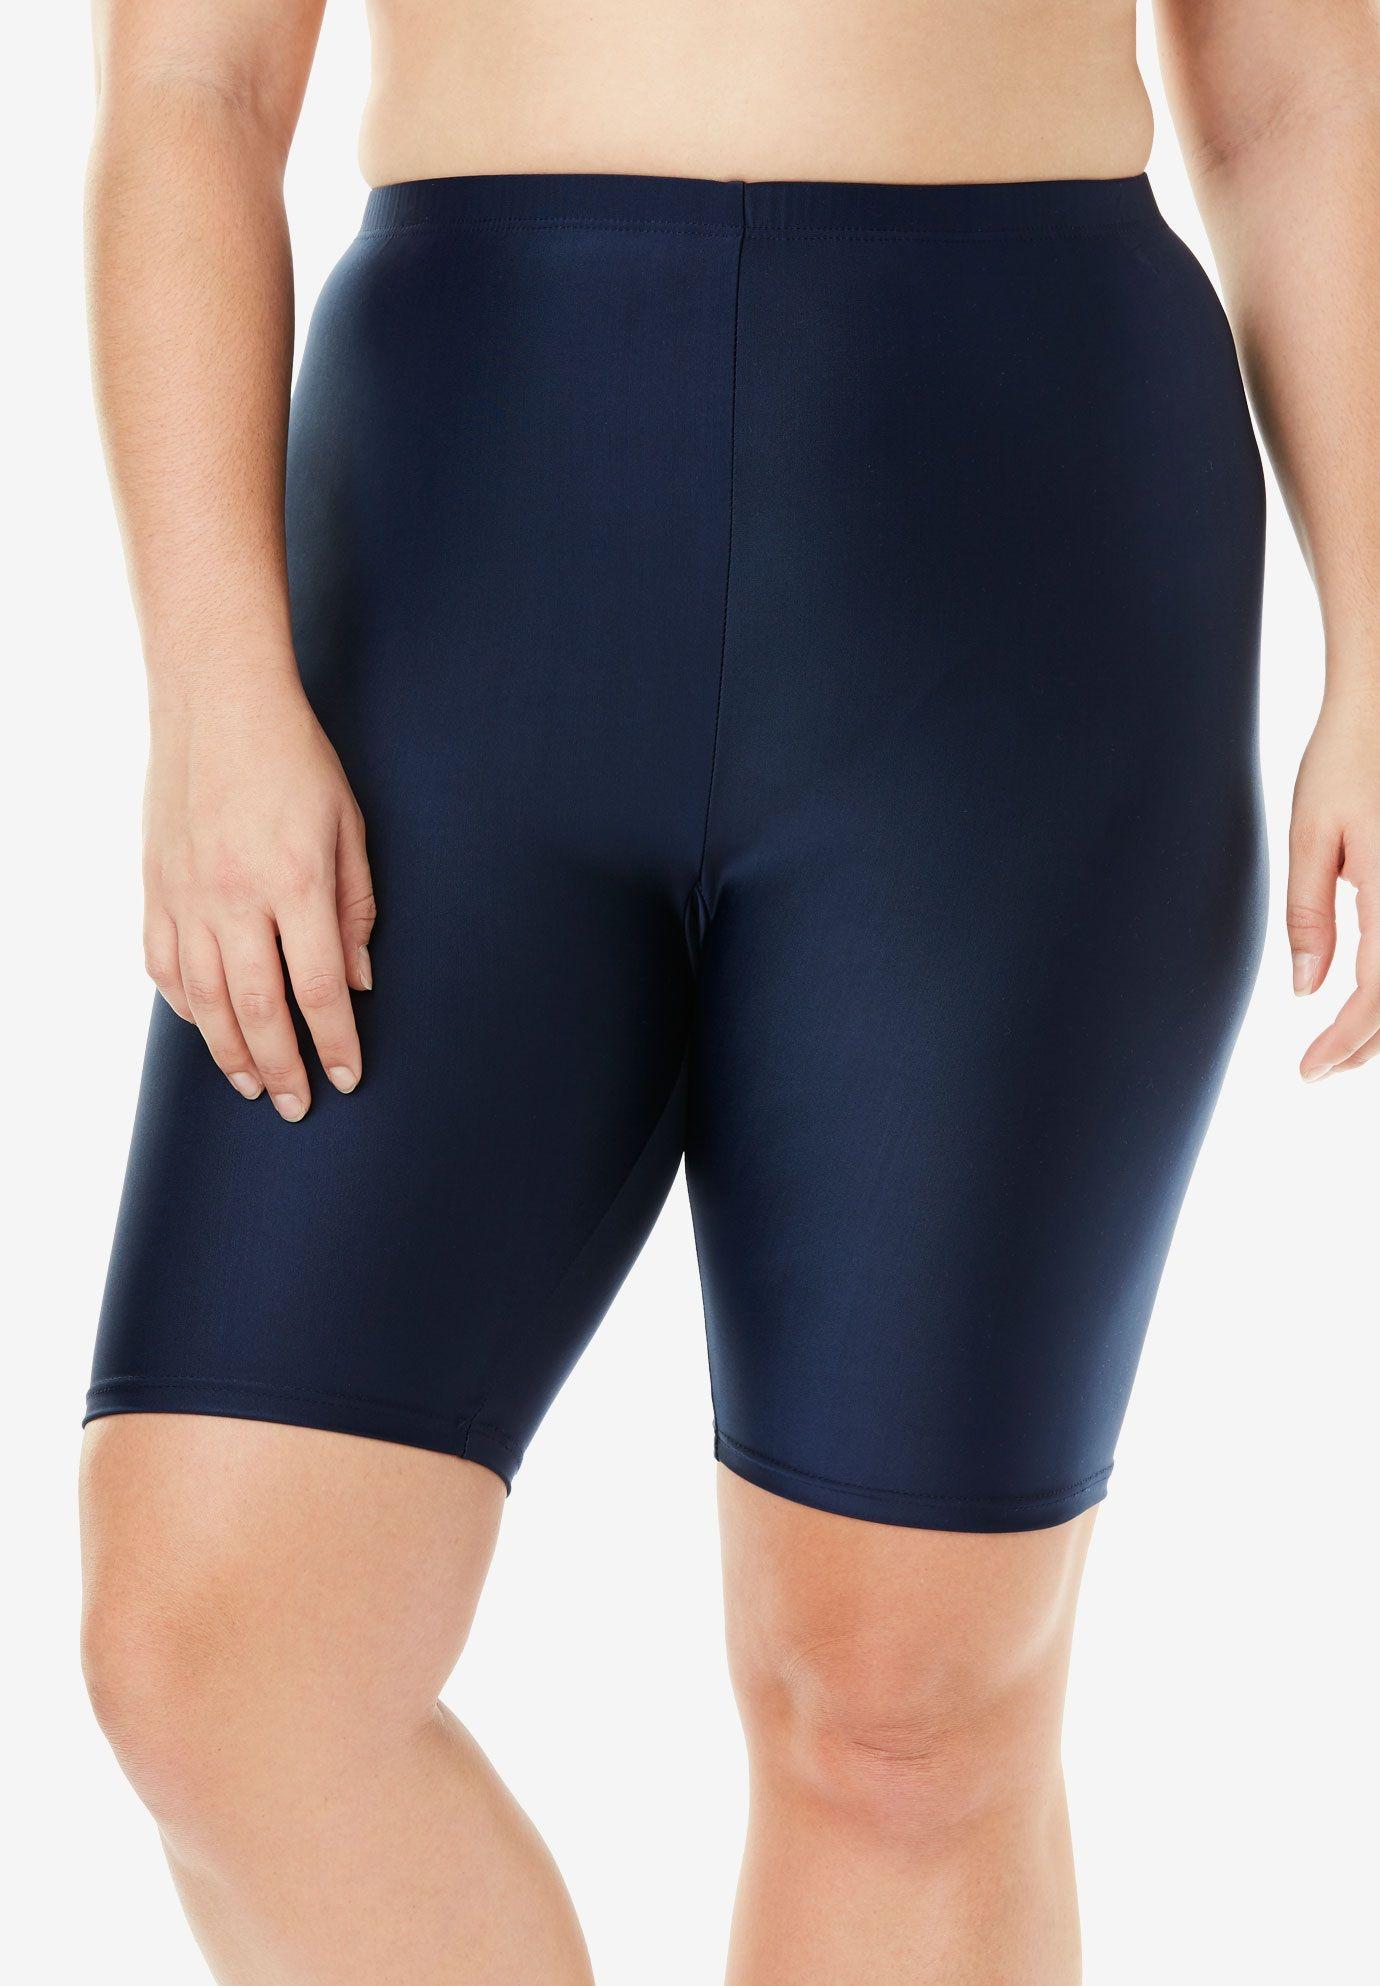 ec5f117636c2ff Aquabelle Extended Length Bike Short, NAVY, hi-res Swim Shorts Women,  Swimsuit